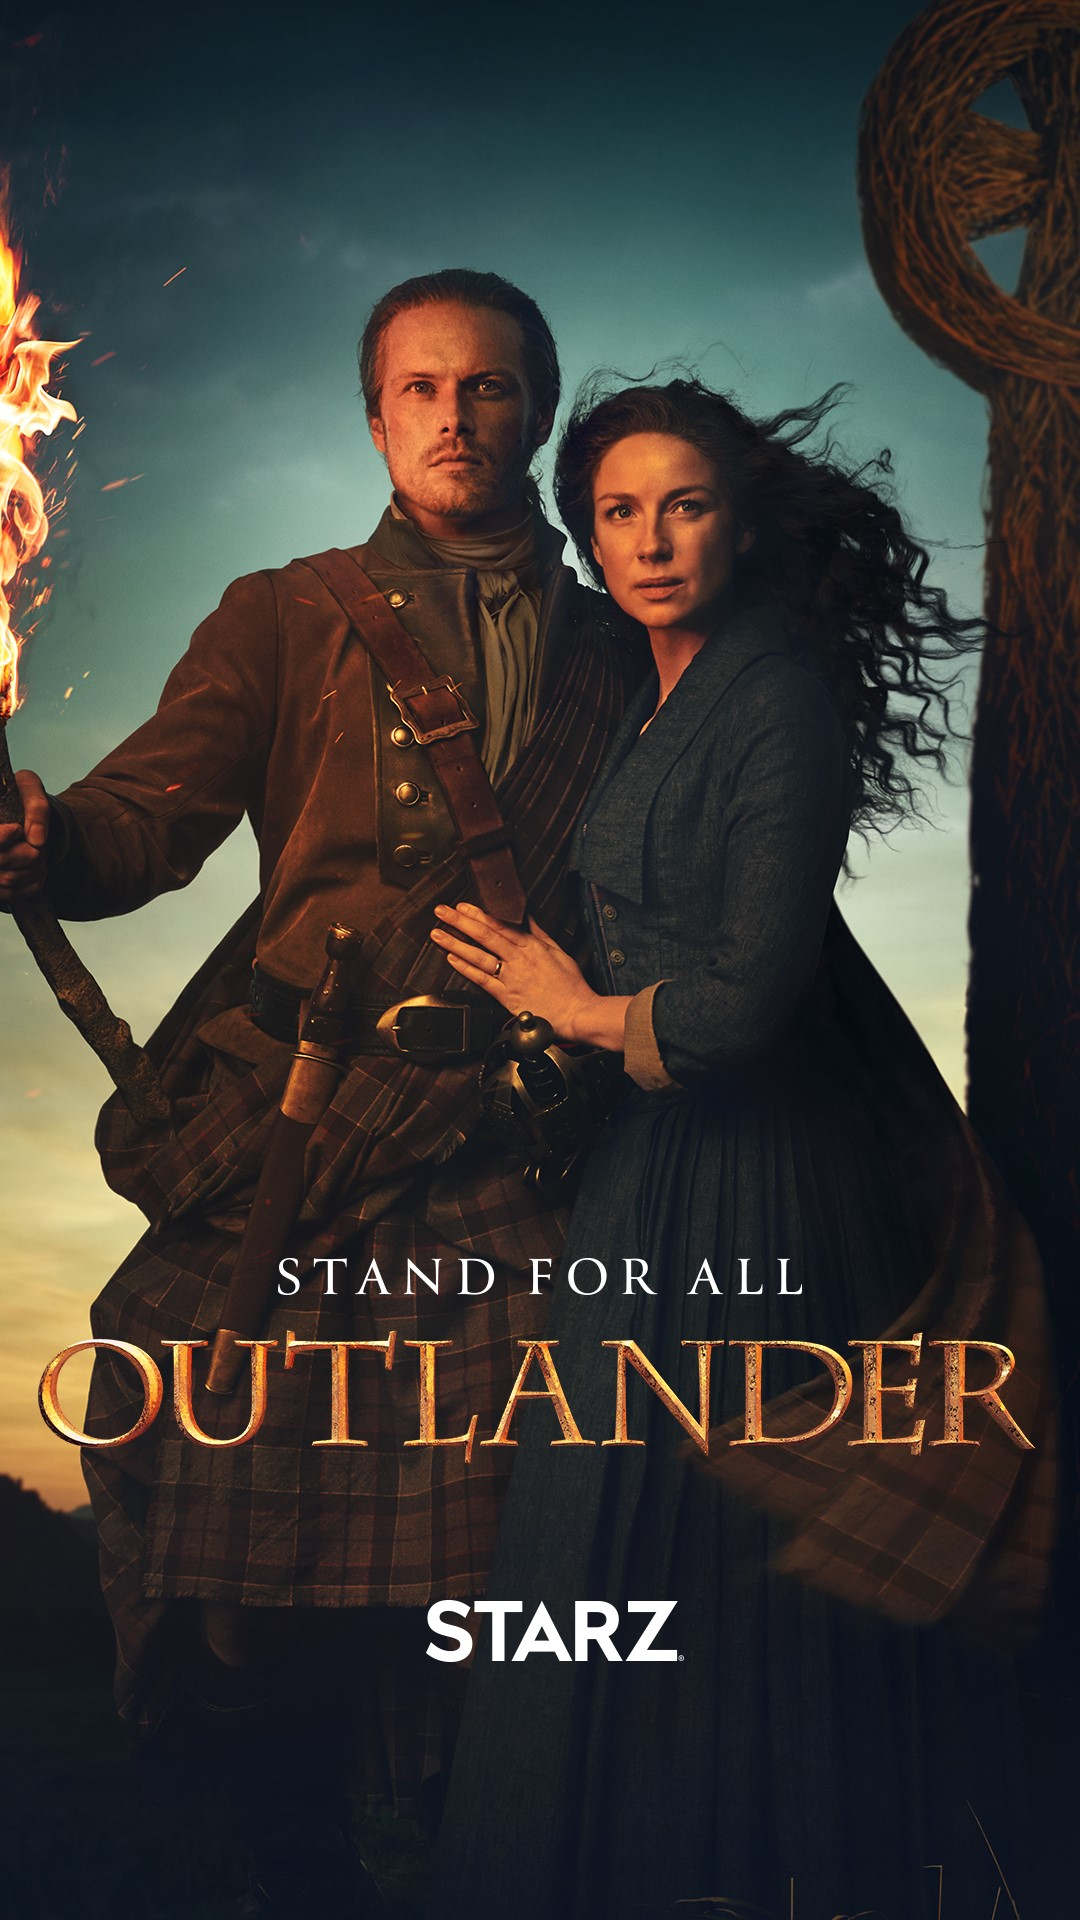 Outlander - New Starz Series